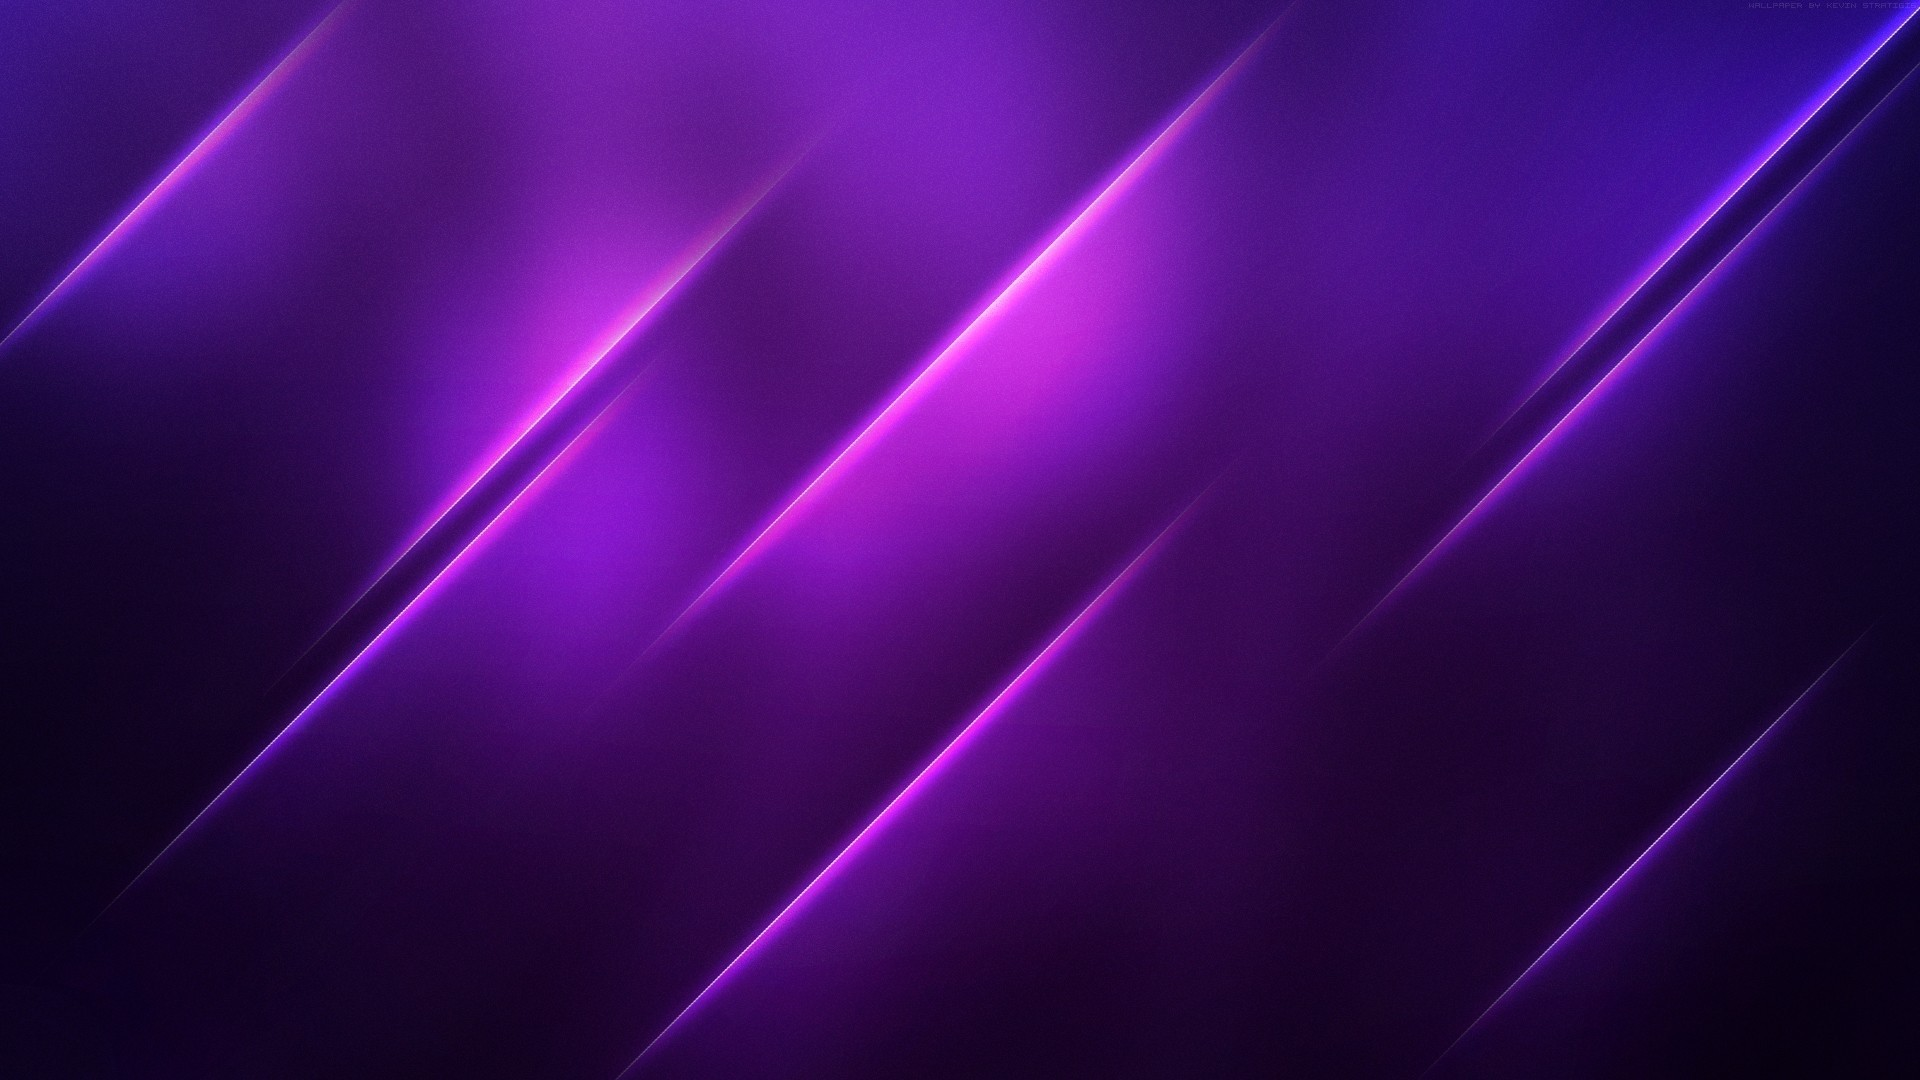 Neat Purple Backgrounds 18538